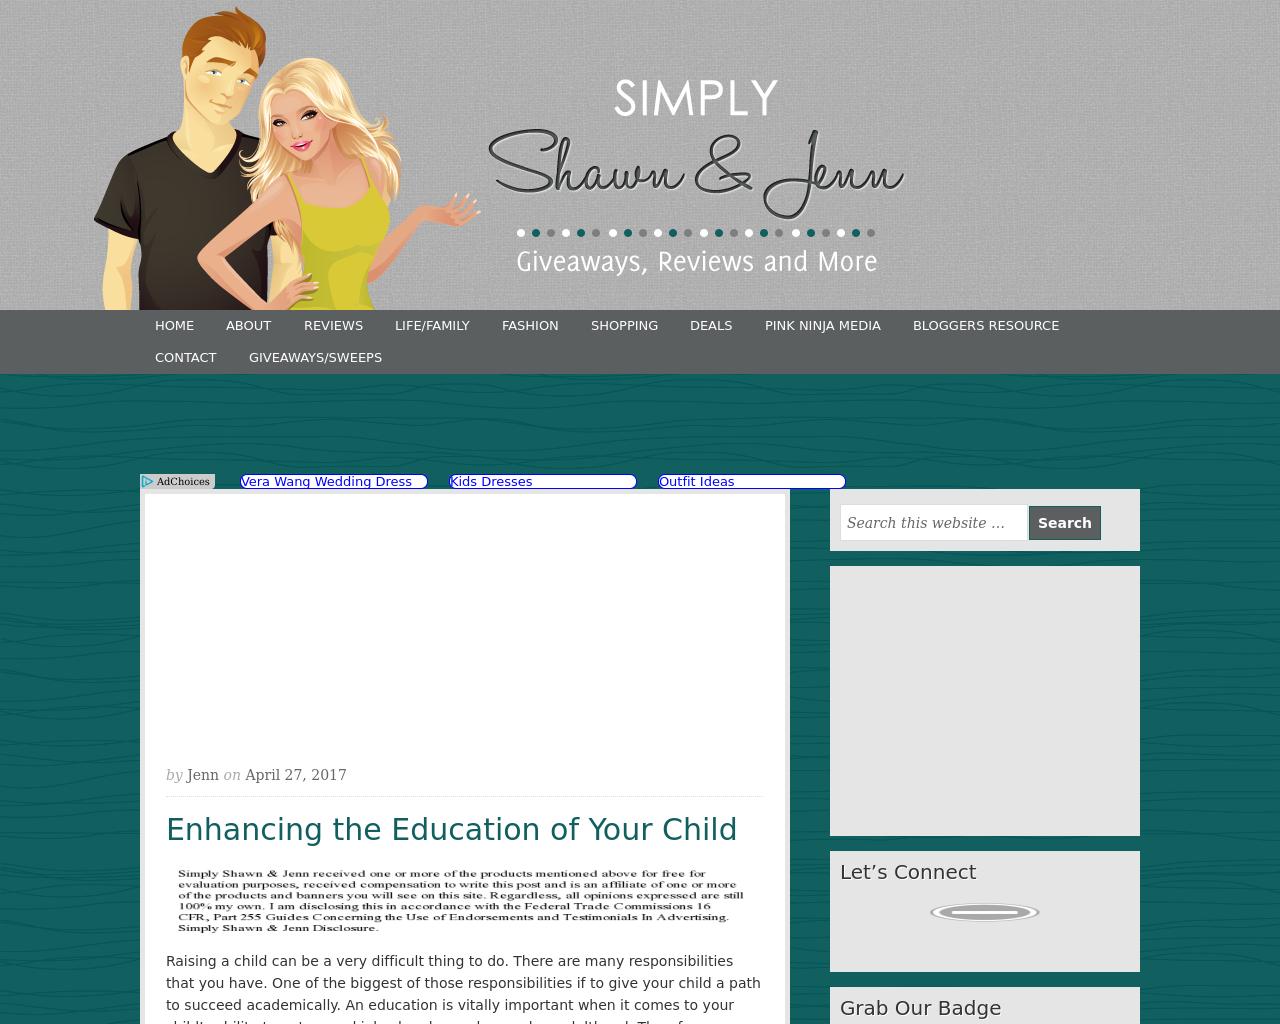 Simply-Shawn-&-Jenn-Advertising-Reviews-Pricing